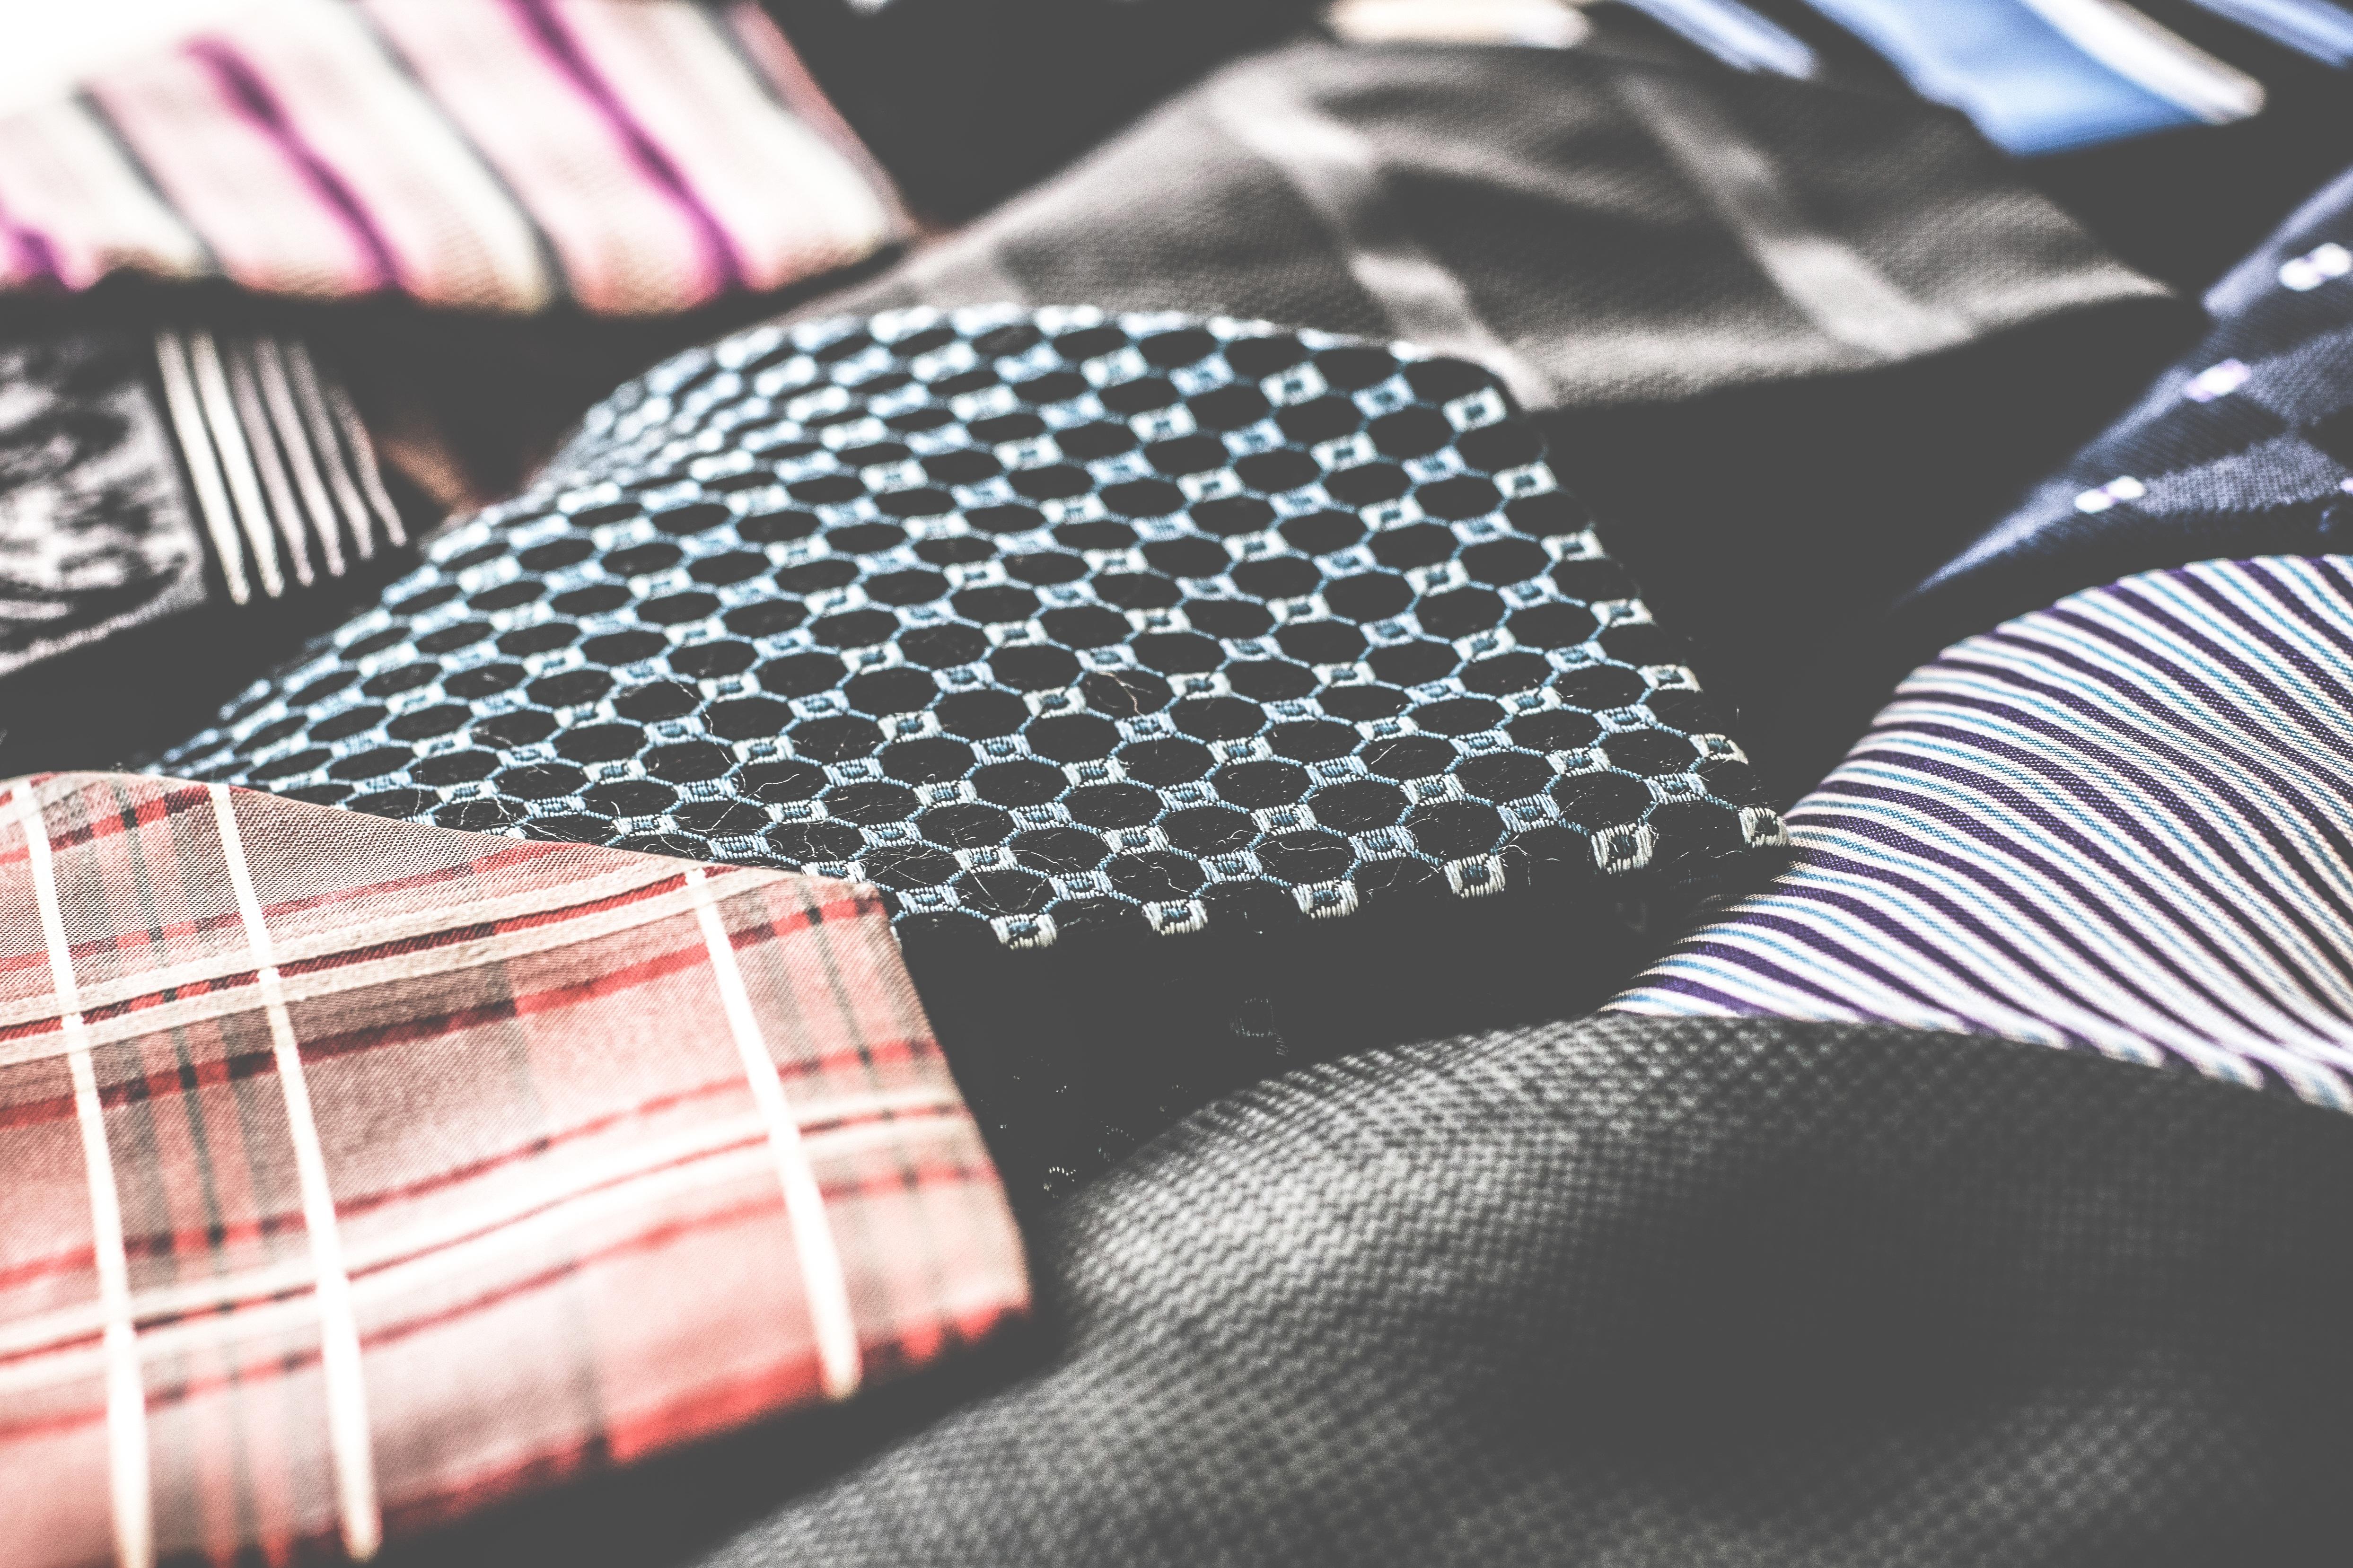 Free Images Texture Pattern Tie Clothing Black Material Fabric Brand Mens Fashion Textile Art Design Silk Noble Raised Necktie Men S Fashion Fashion Accessory Business Attire 4974x3315 1173654 Free Stock Photos Pxhere